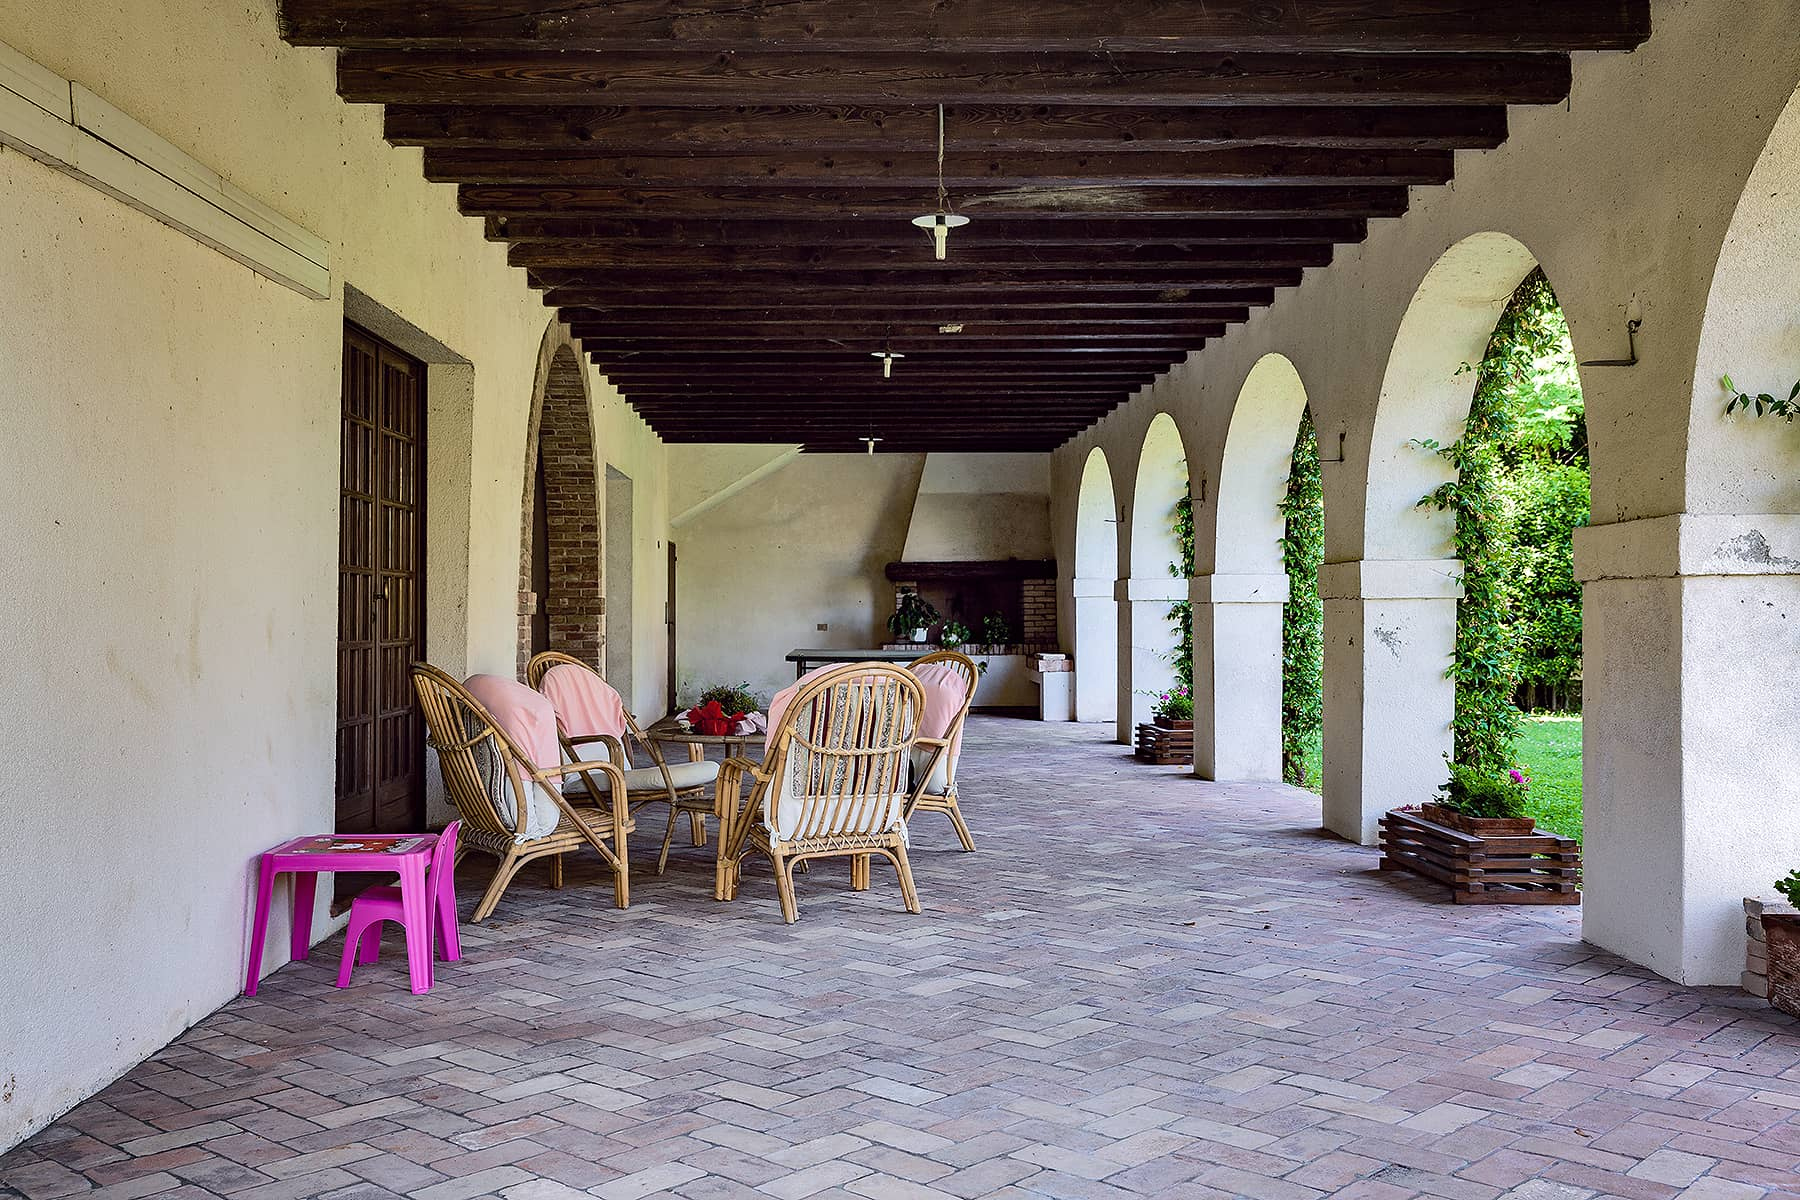 Villa in Vendita a Carbonera: 5 locali, 850 mq - Foto 6